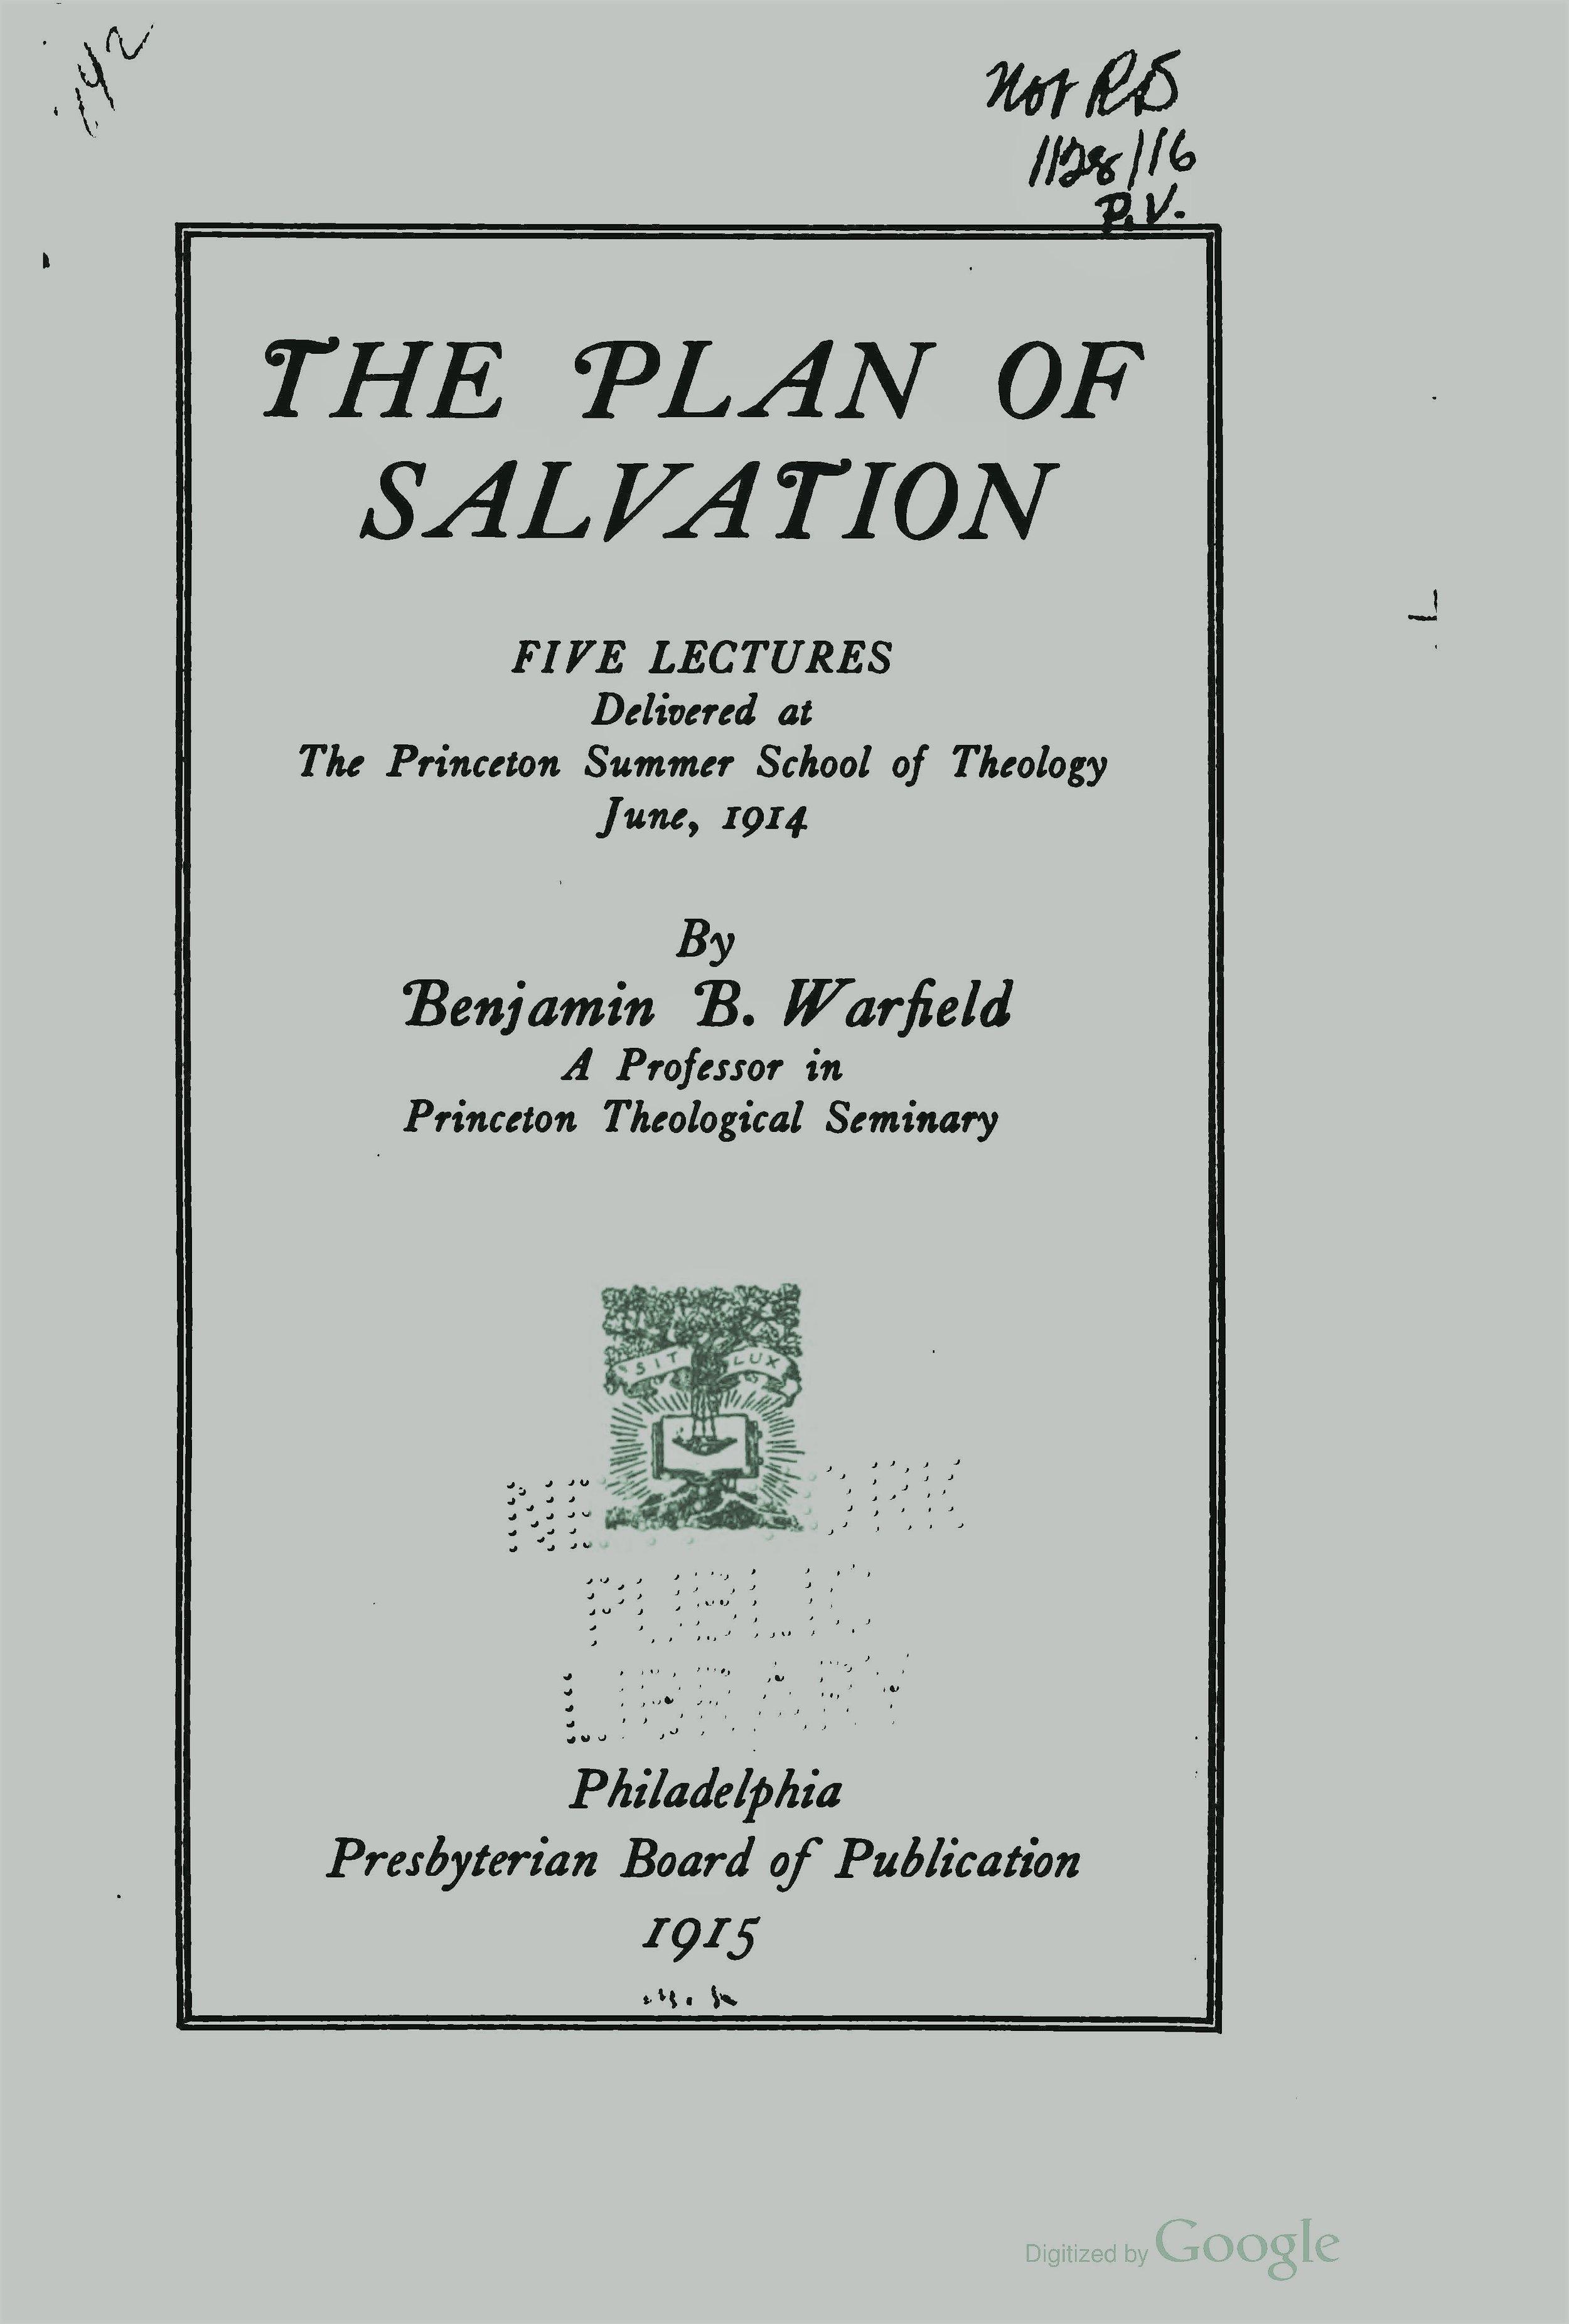 Warfield, Benjamin Breckinridge, The Plan of Salvation Title Page.jpg